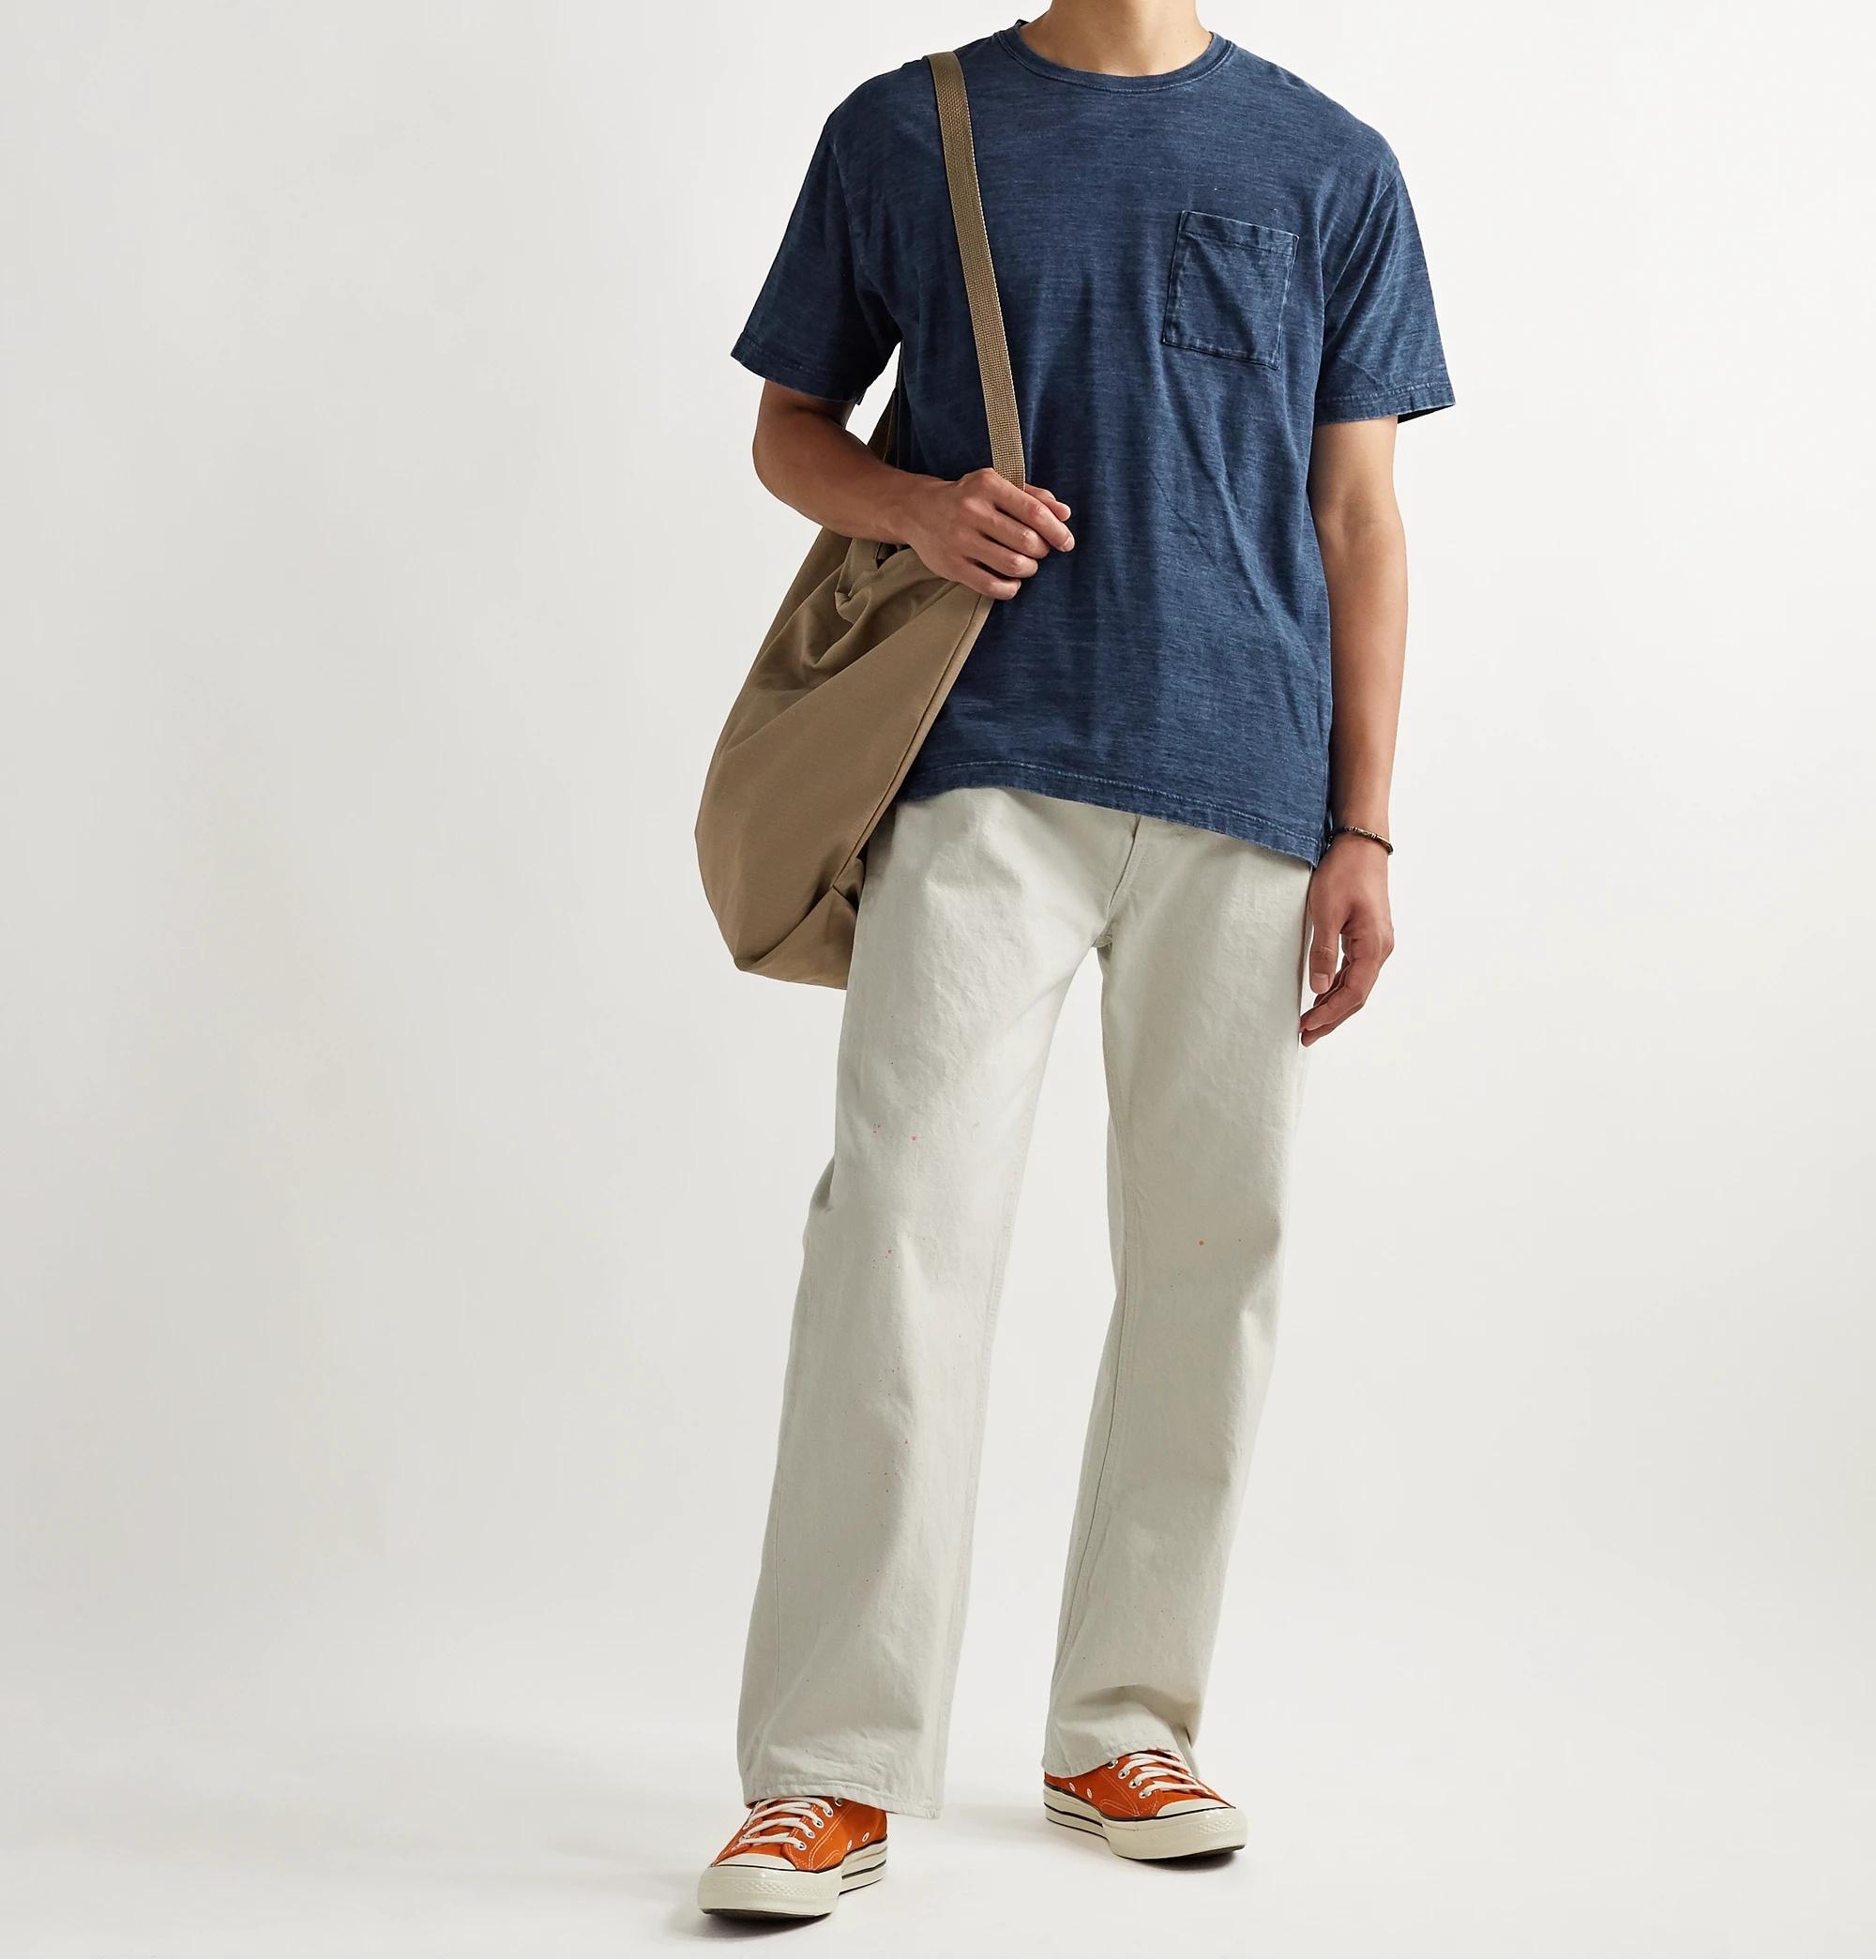 Custom print logo cotton jersey lightweight stretch fitness sprots t shirts for men